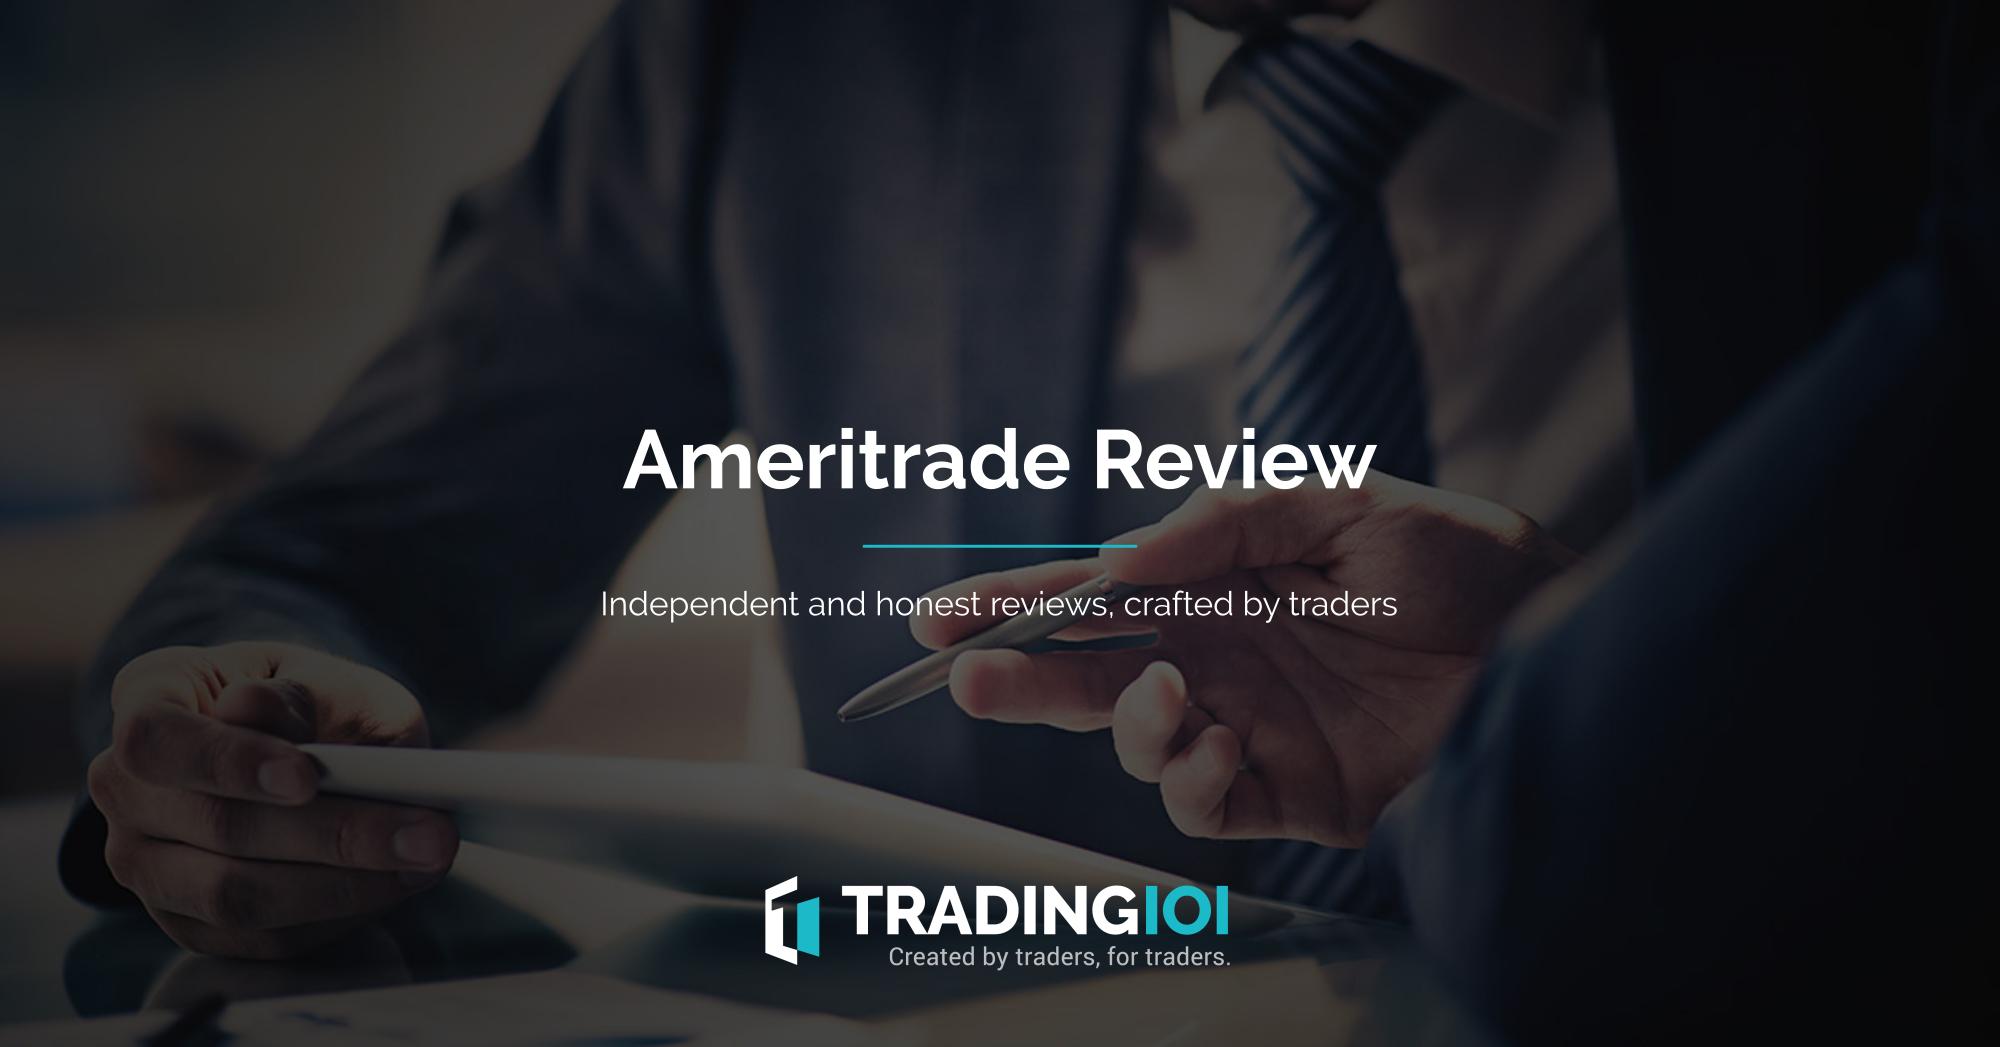 Trading 101 | Ameritrade Review 2018